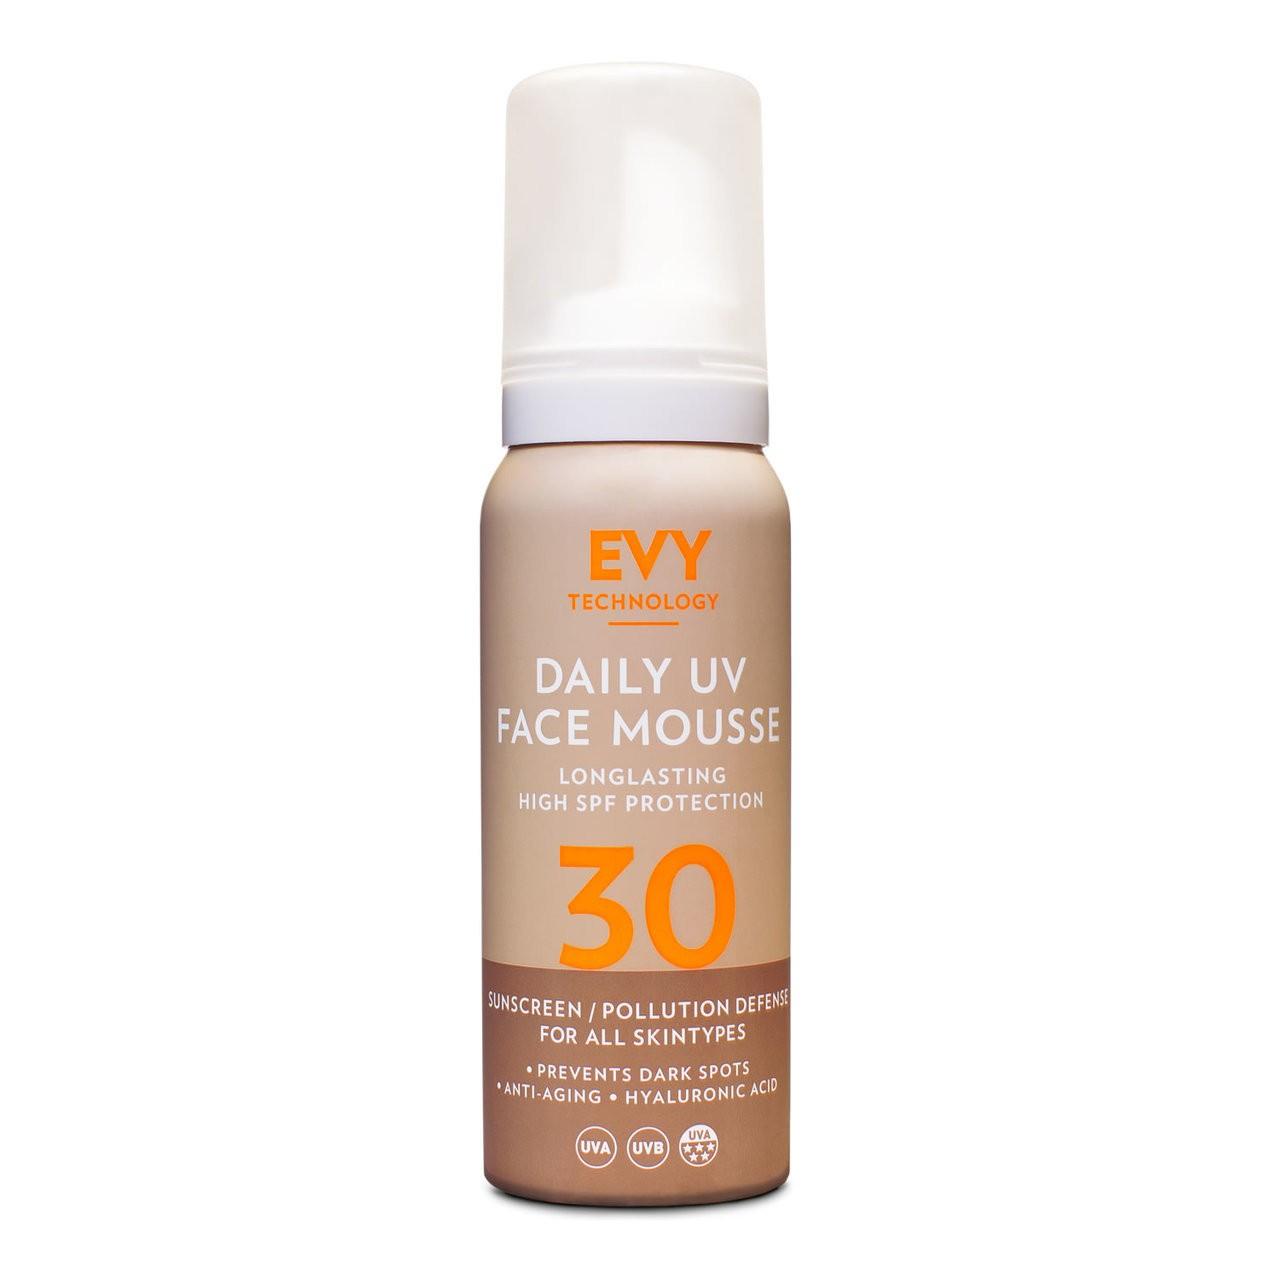 evy-uv-face-sun-mousse-spf30-shop-harley-street-emporium